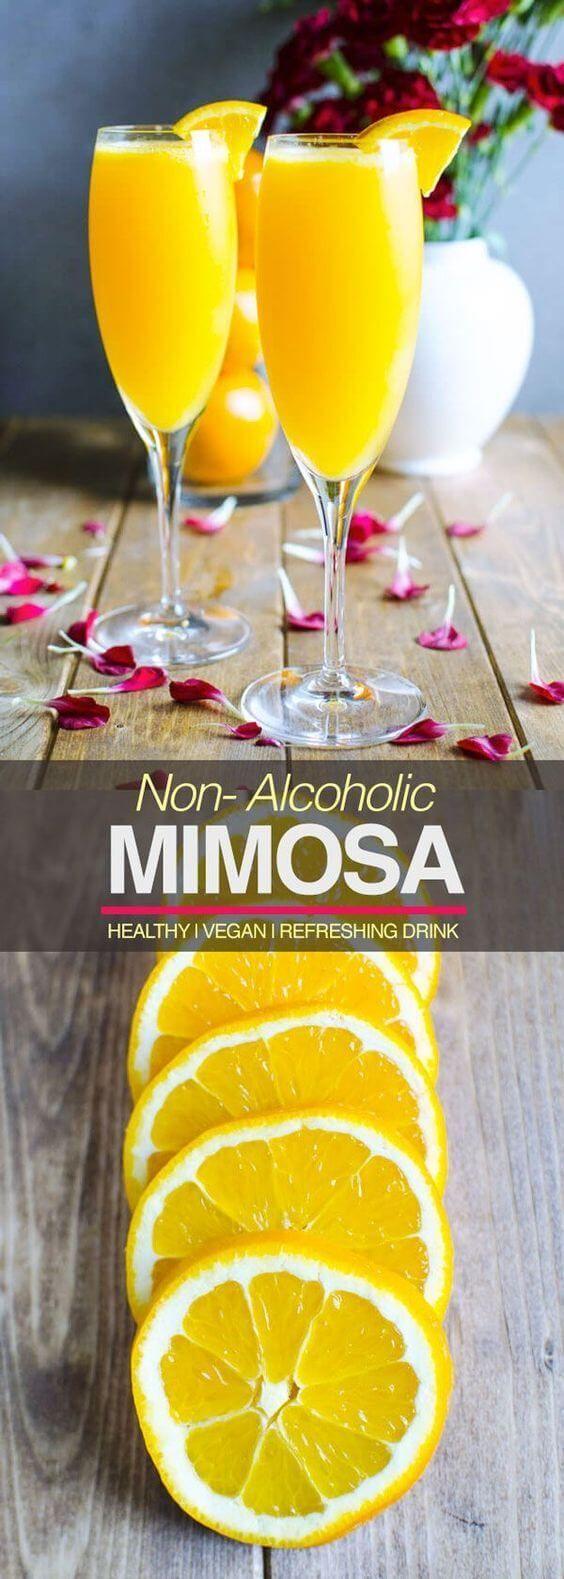 Non Alcoholic Apple Cider Mimosa